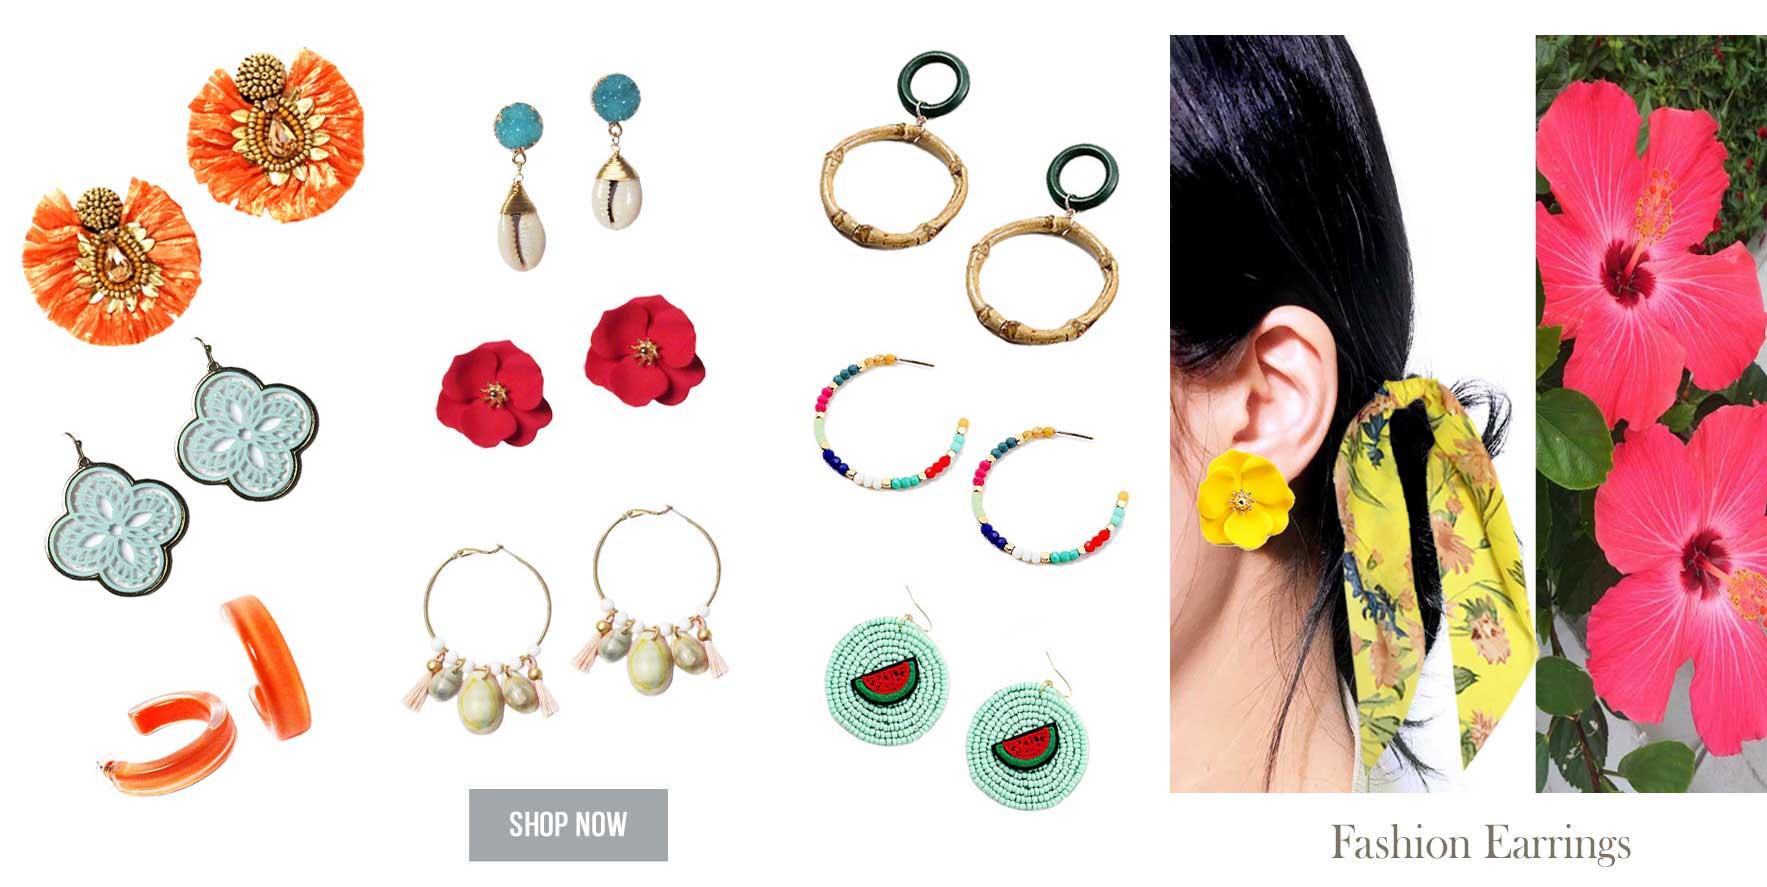 2019 Summer Fashion Earring